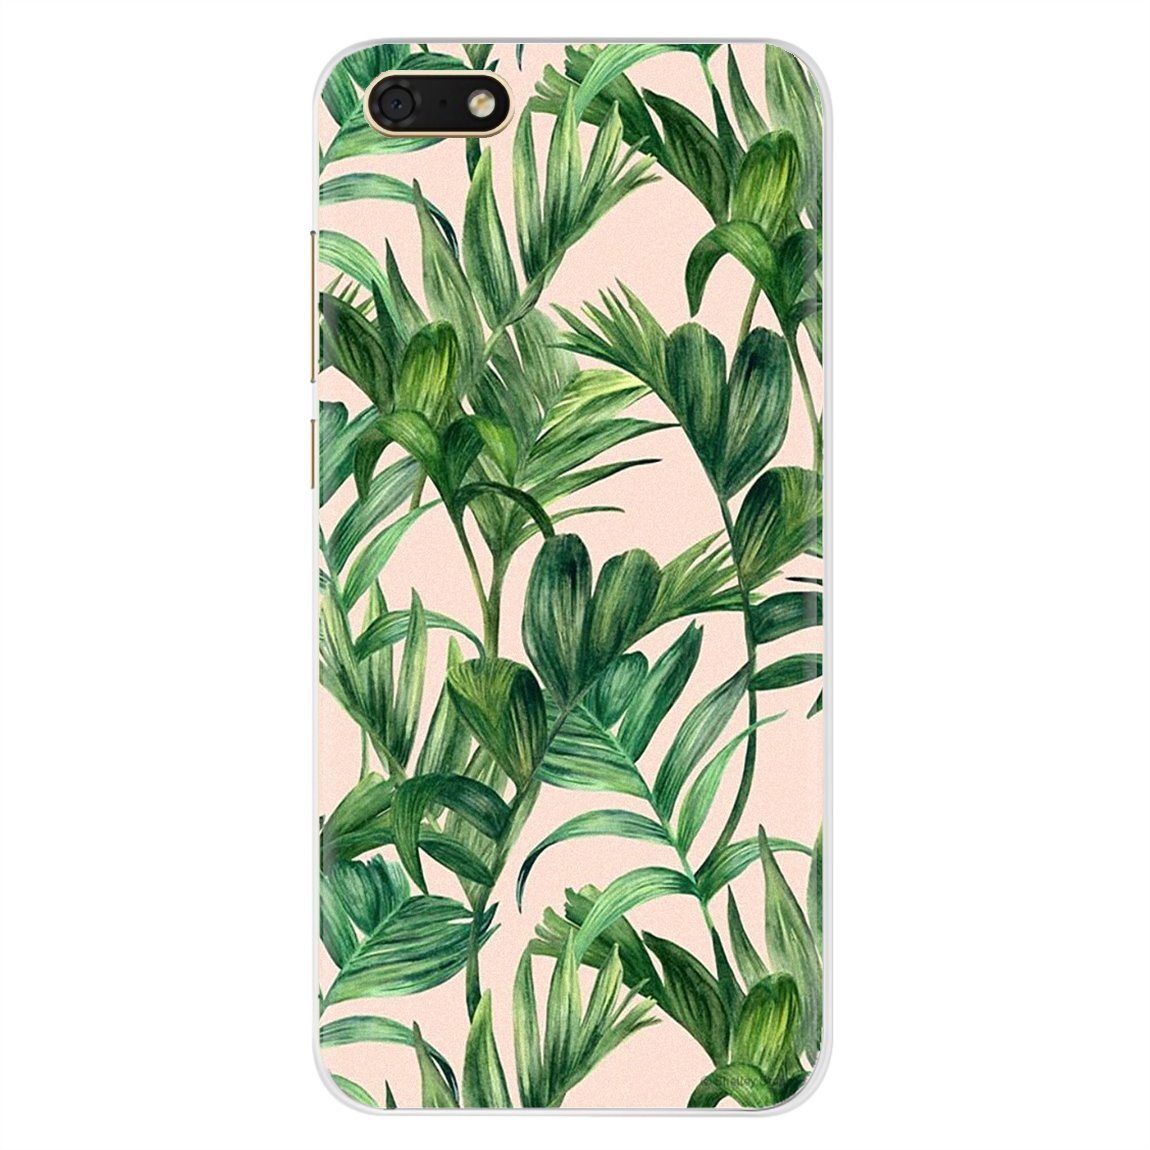 Para Samsung Galaxy J1 J2 J3 J4 J5 J6 J7 J8 Plus 2018 Prime 2015 2016 2017 Designer de Caso de Telefone Silicone Fruit Melancia Flamingo